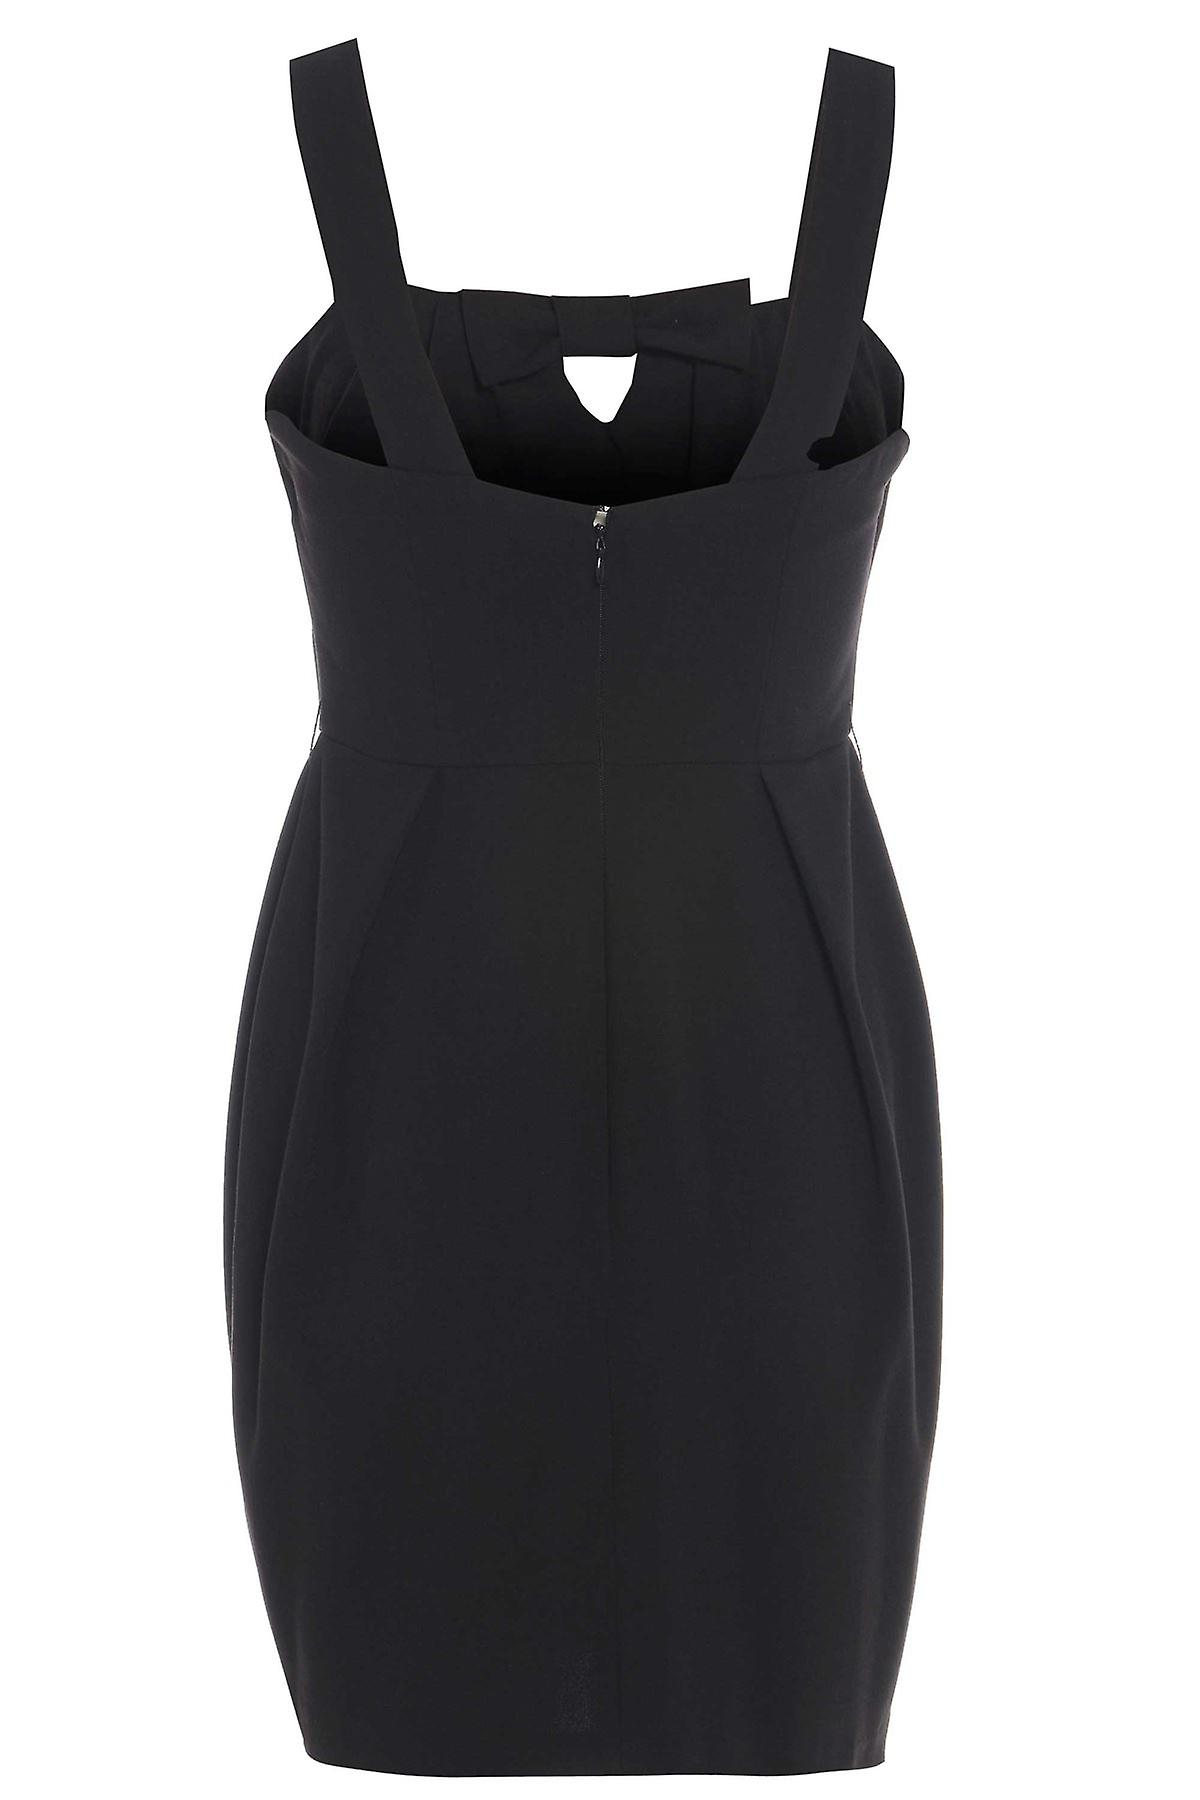 Asos Bow Feature Black Dress DR452-10